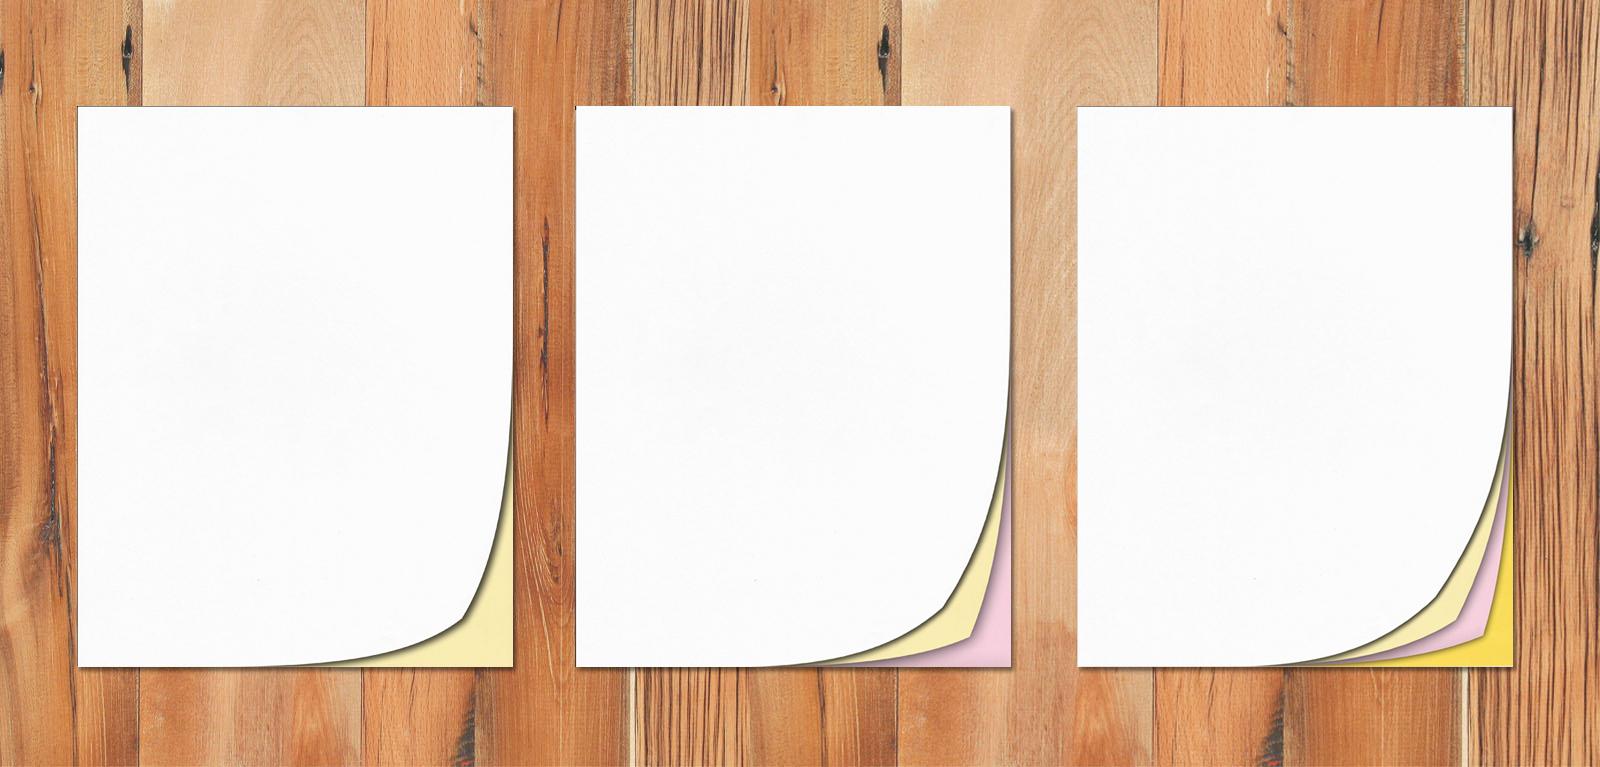 3 part carbonless paper, carbonless paper, blank carbonless paper, ncr paper, carbonless products, laser carbonless paper, carbonless form paper, carbonless paper 3 part